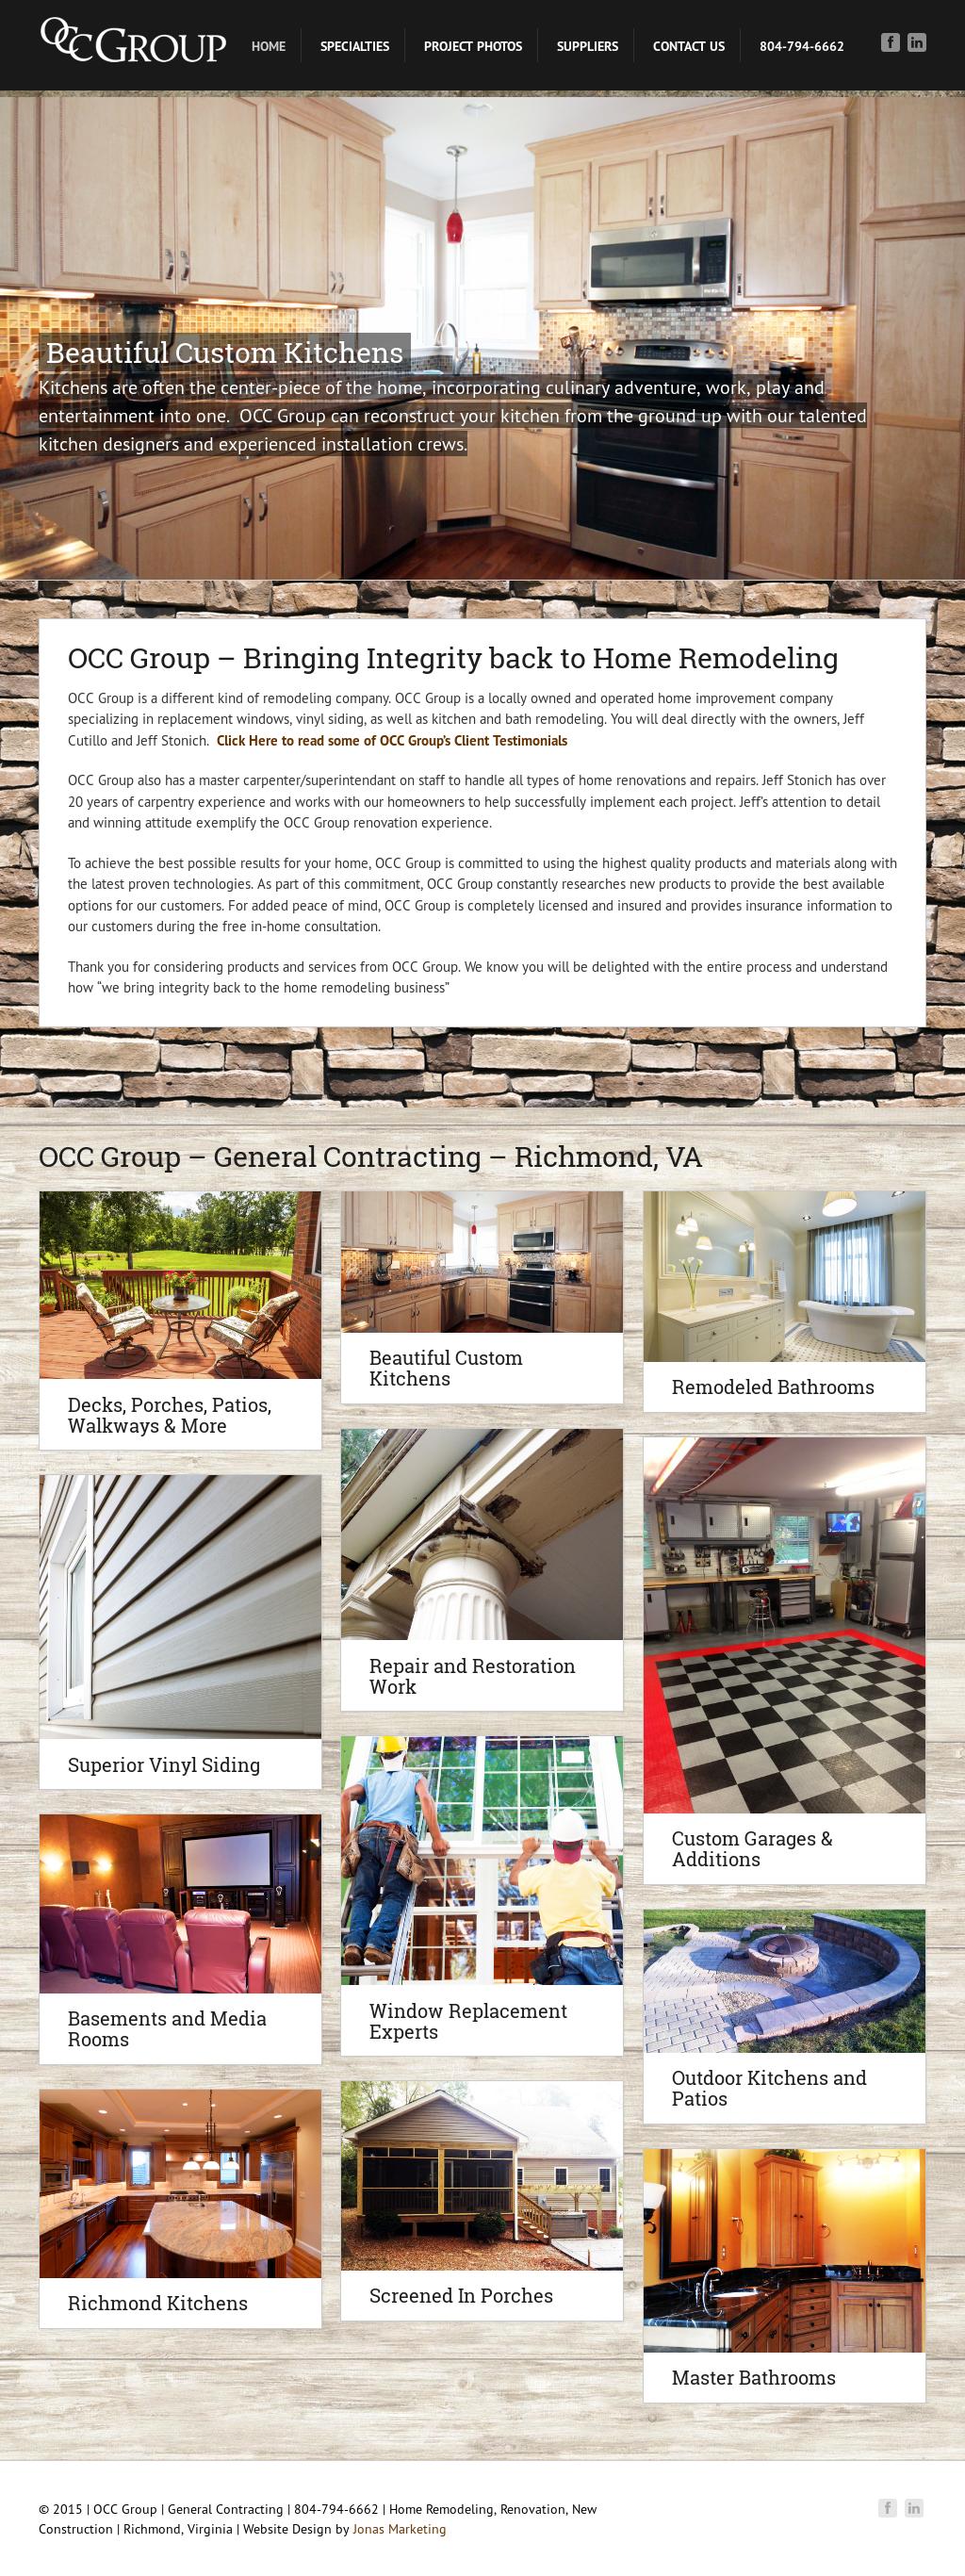 Occrichmond Competitors, Revenue and Employees - Owler Company Profile